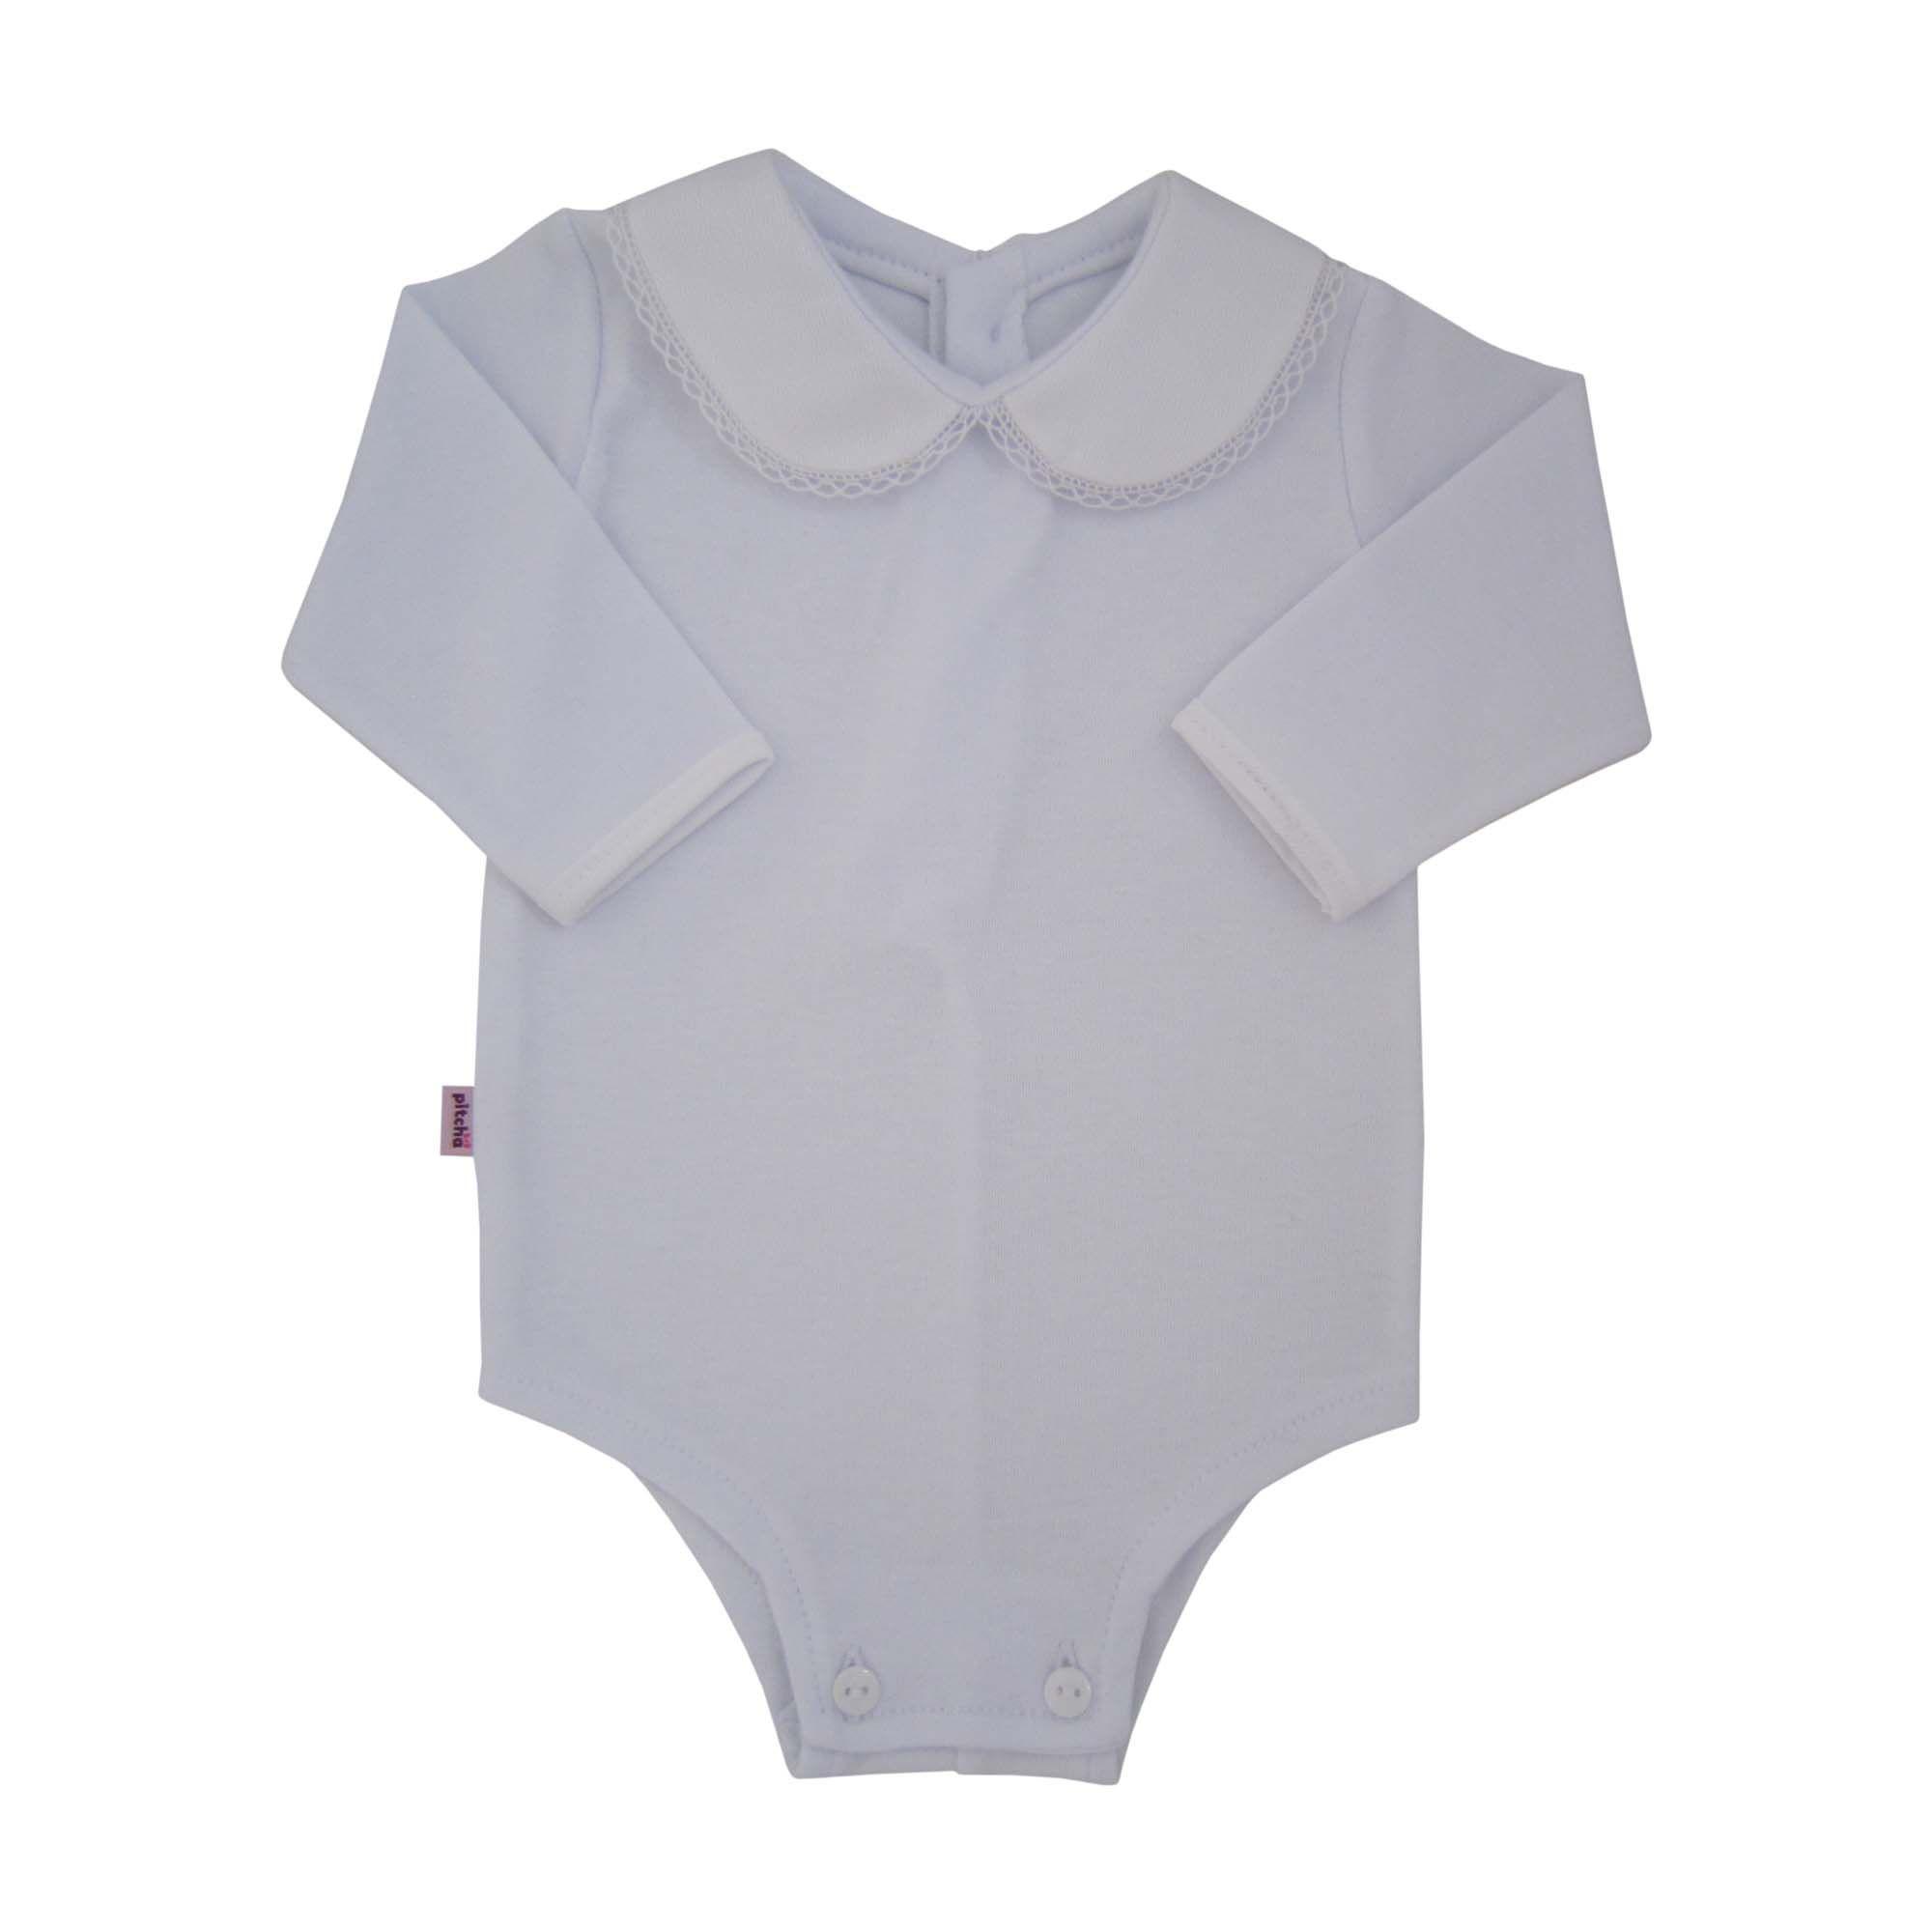 ca988b4bd Body Para Bebê com Gola de Renda Branco - Pitcha ...